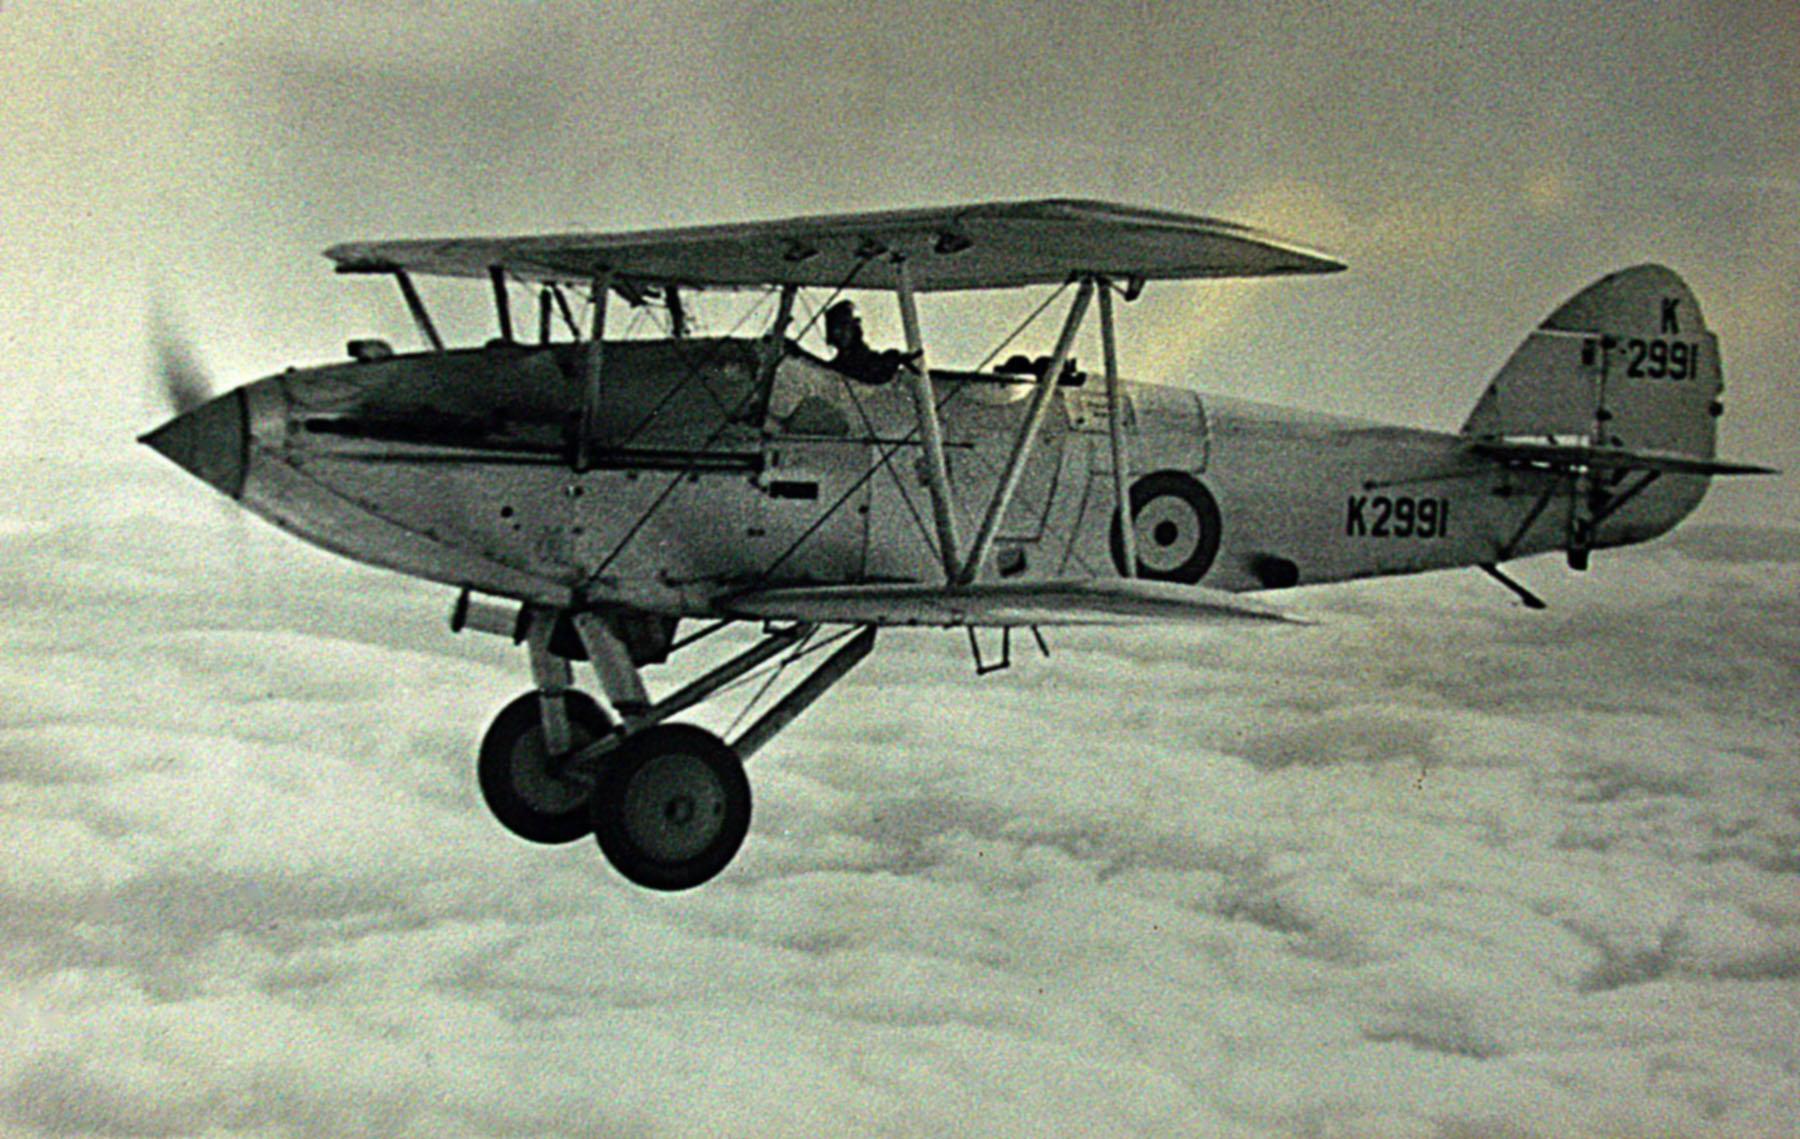 Hawker Hart I RAF K2991 trainer photo taken by Patrick Hayes KIA July 7 1940 01